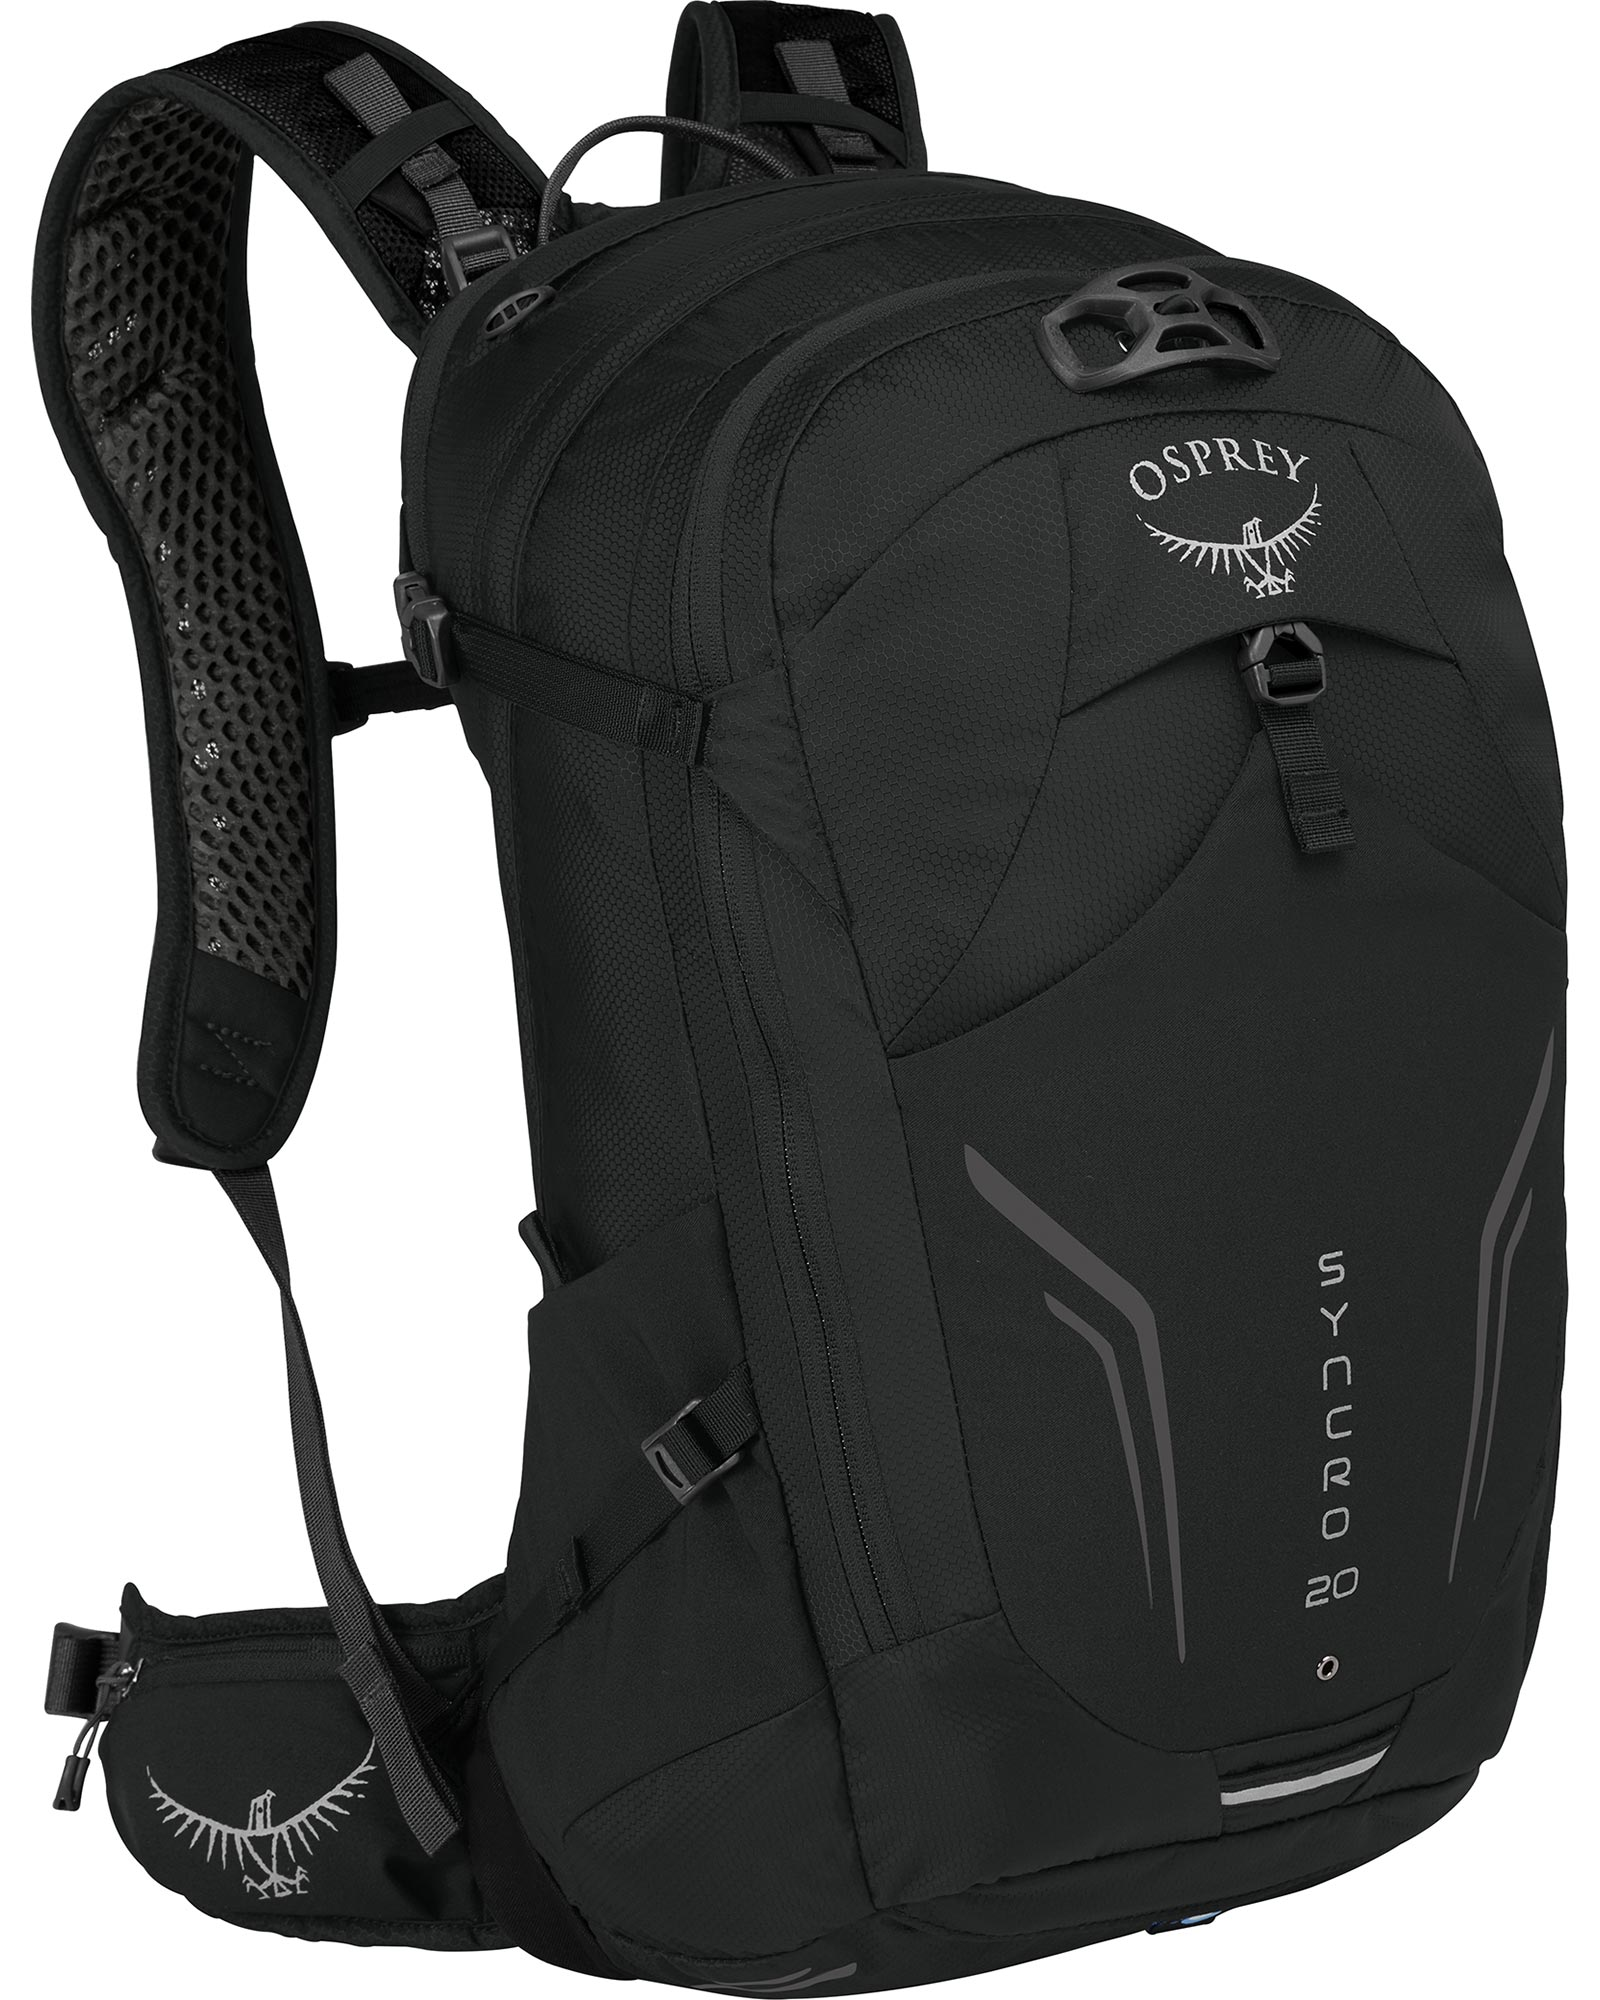 Osprey Men's Syncro 20 Backpack 0